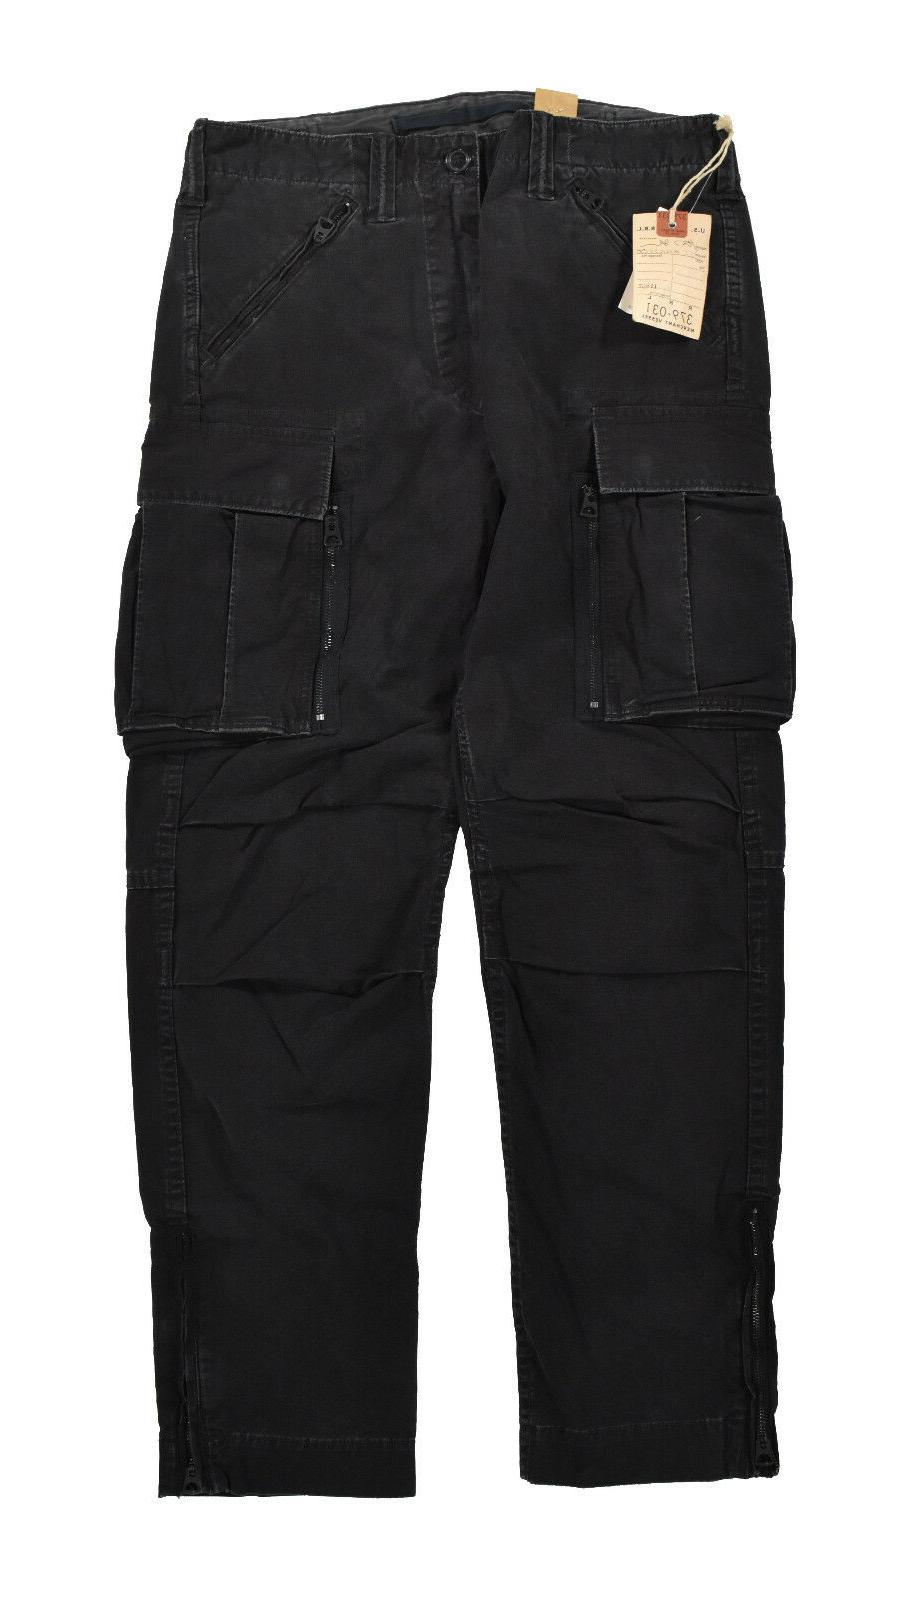 black heavy cotton u s military cargo